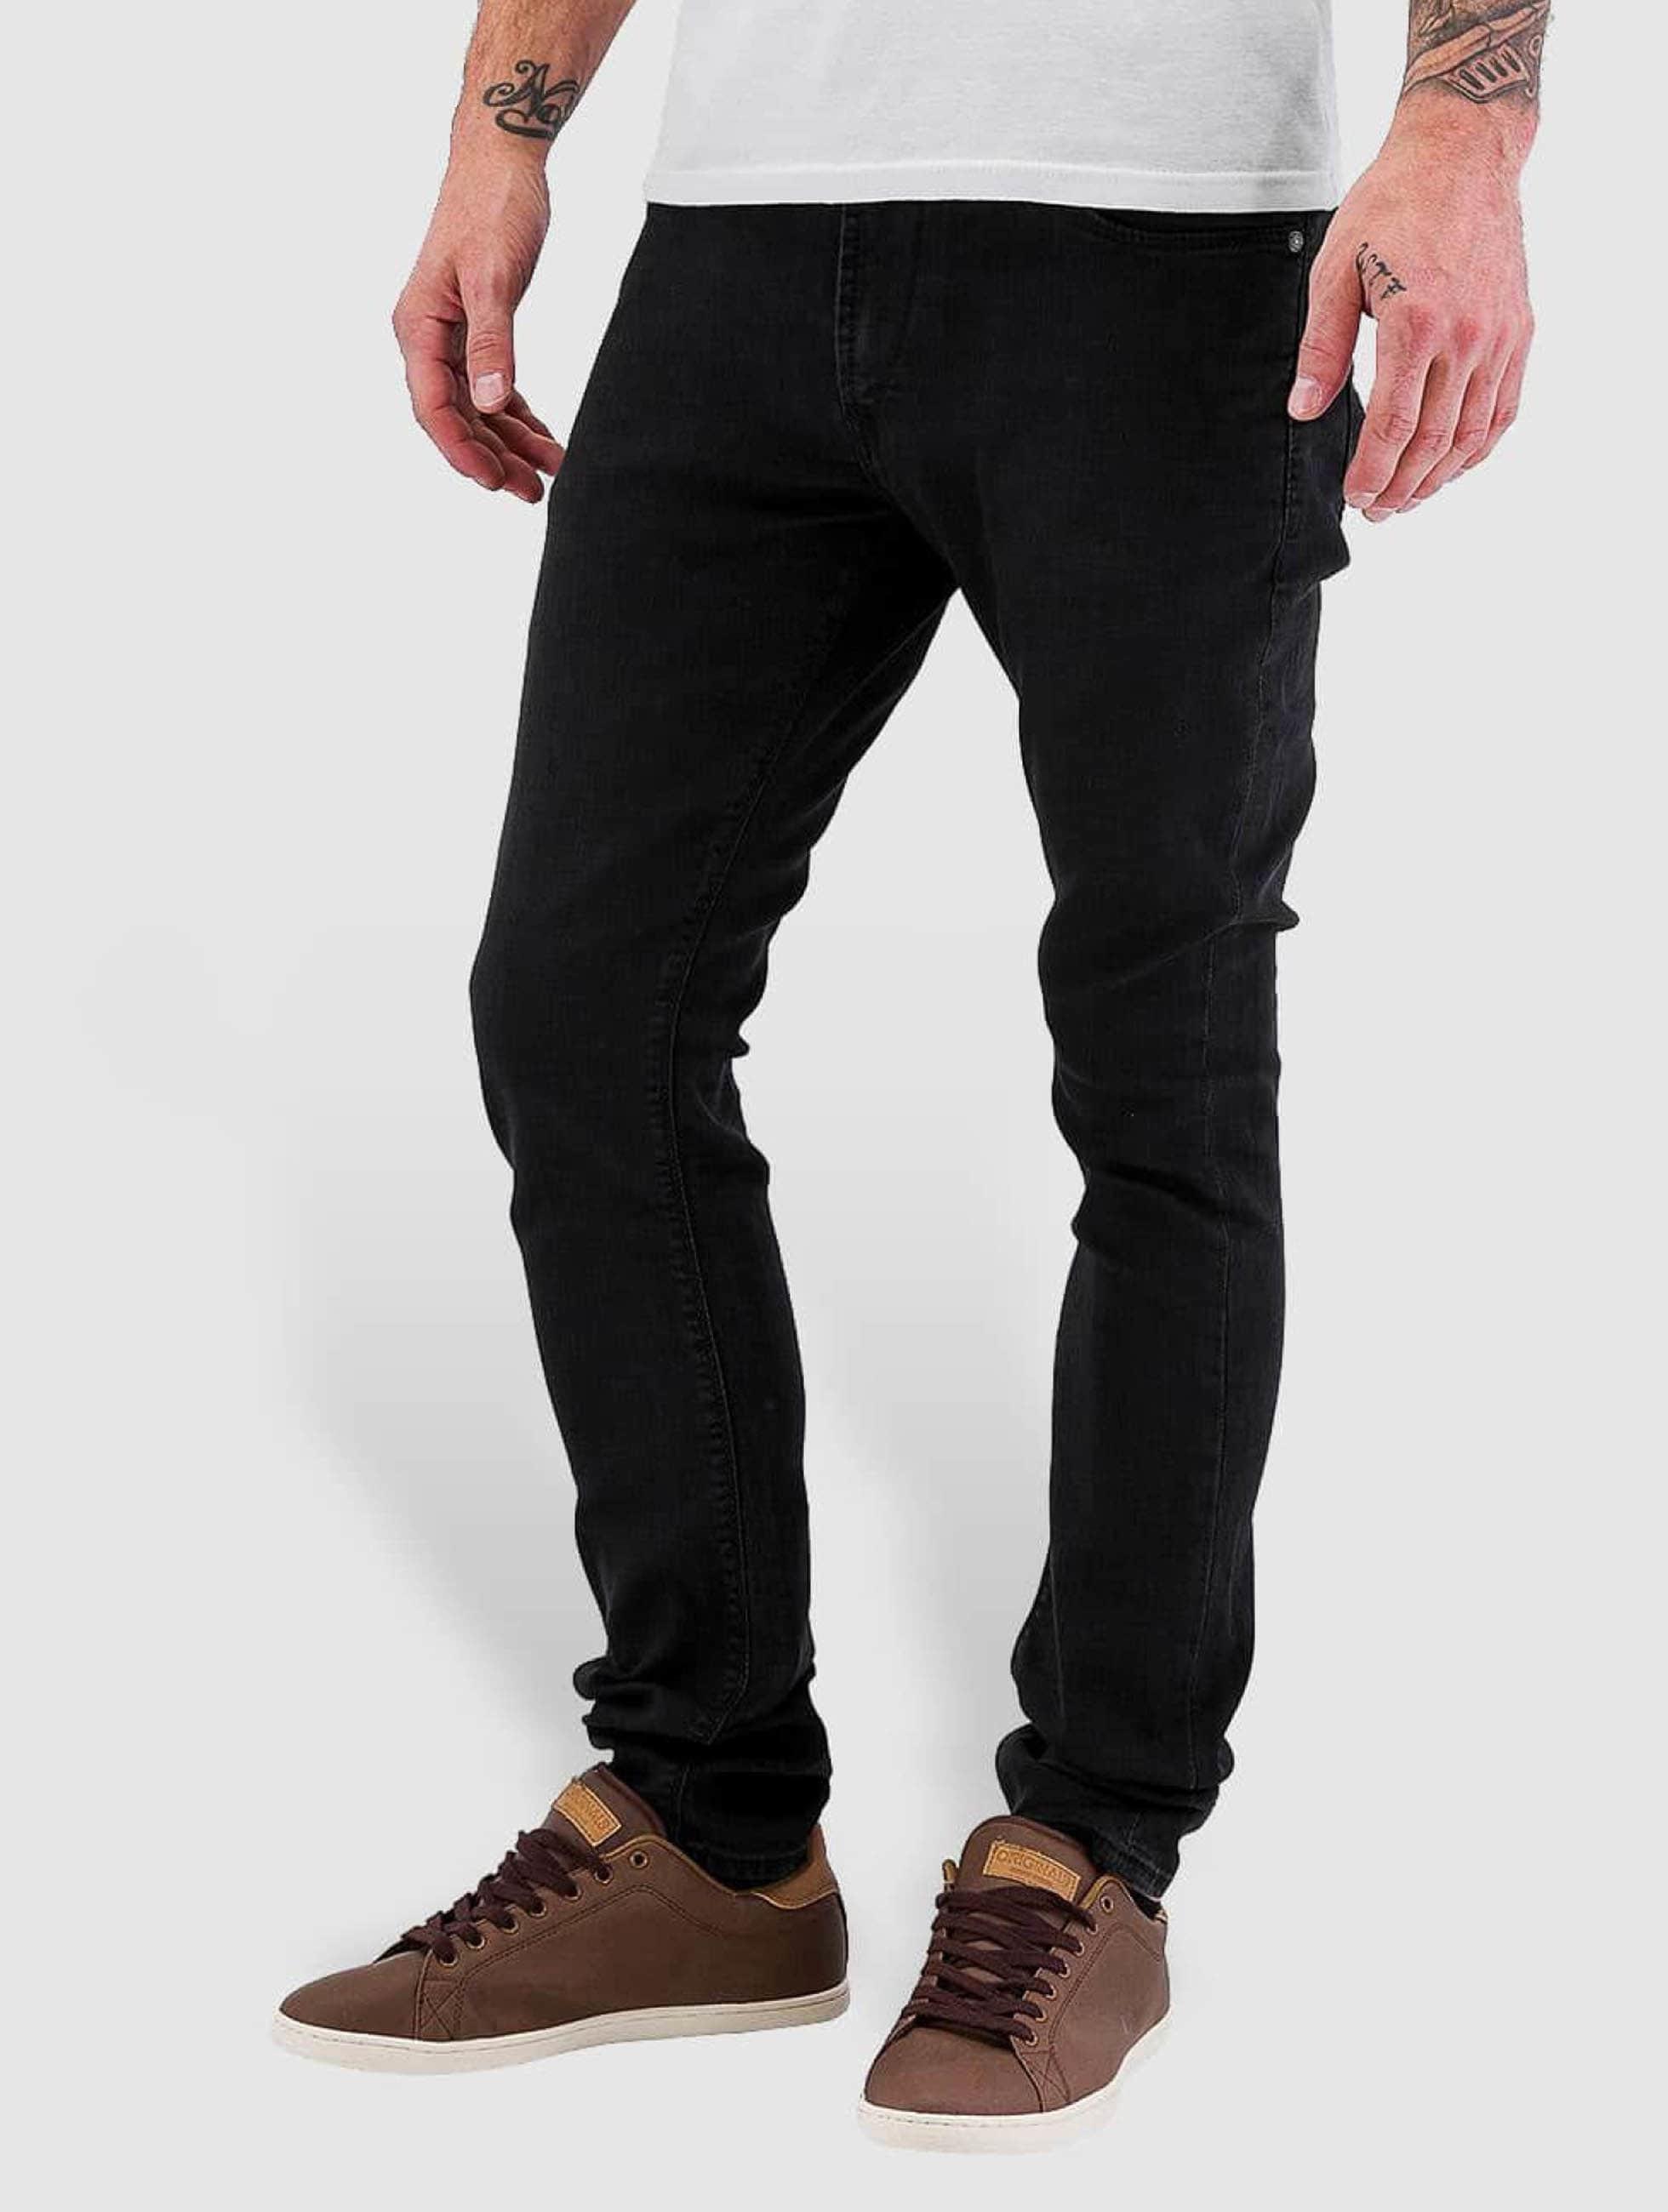 Reell Jeans Radar Stretch Super noir Jean skinny homme